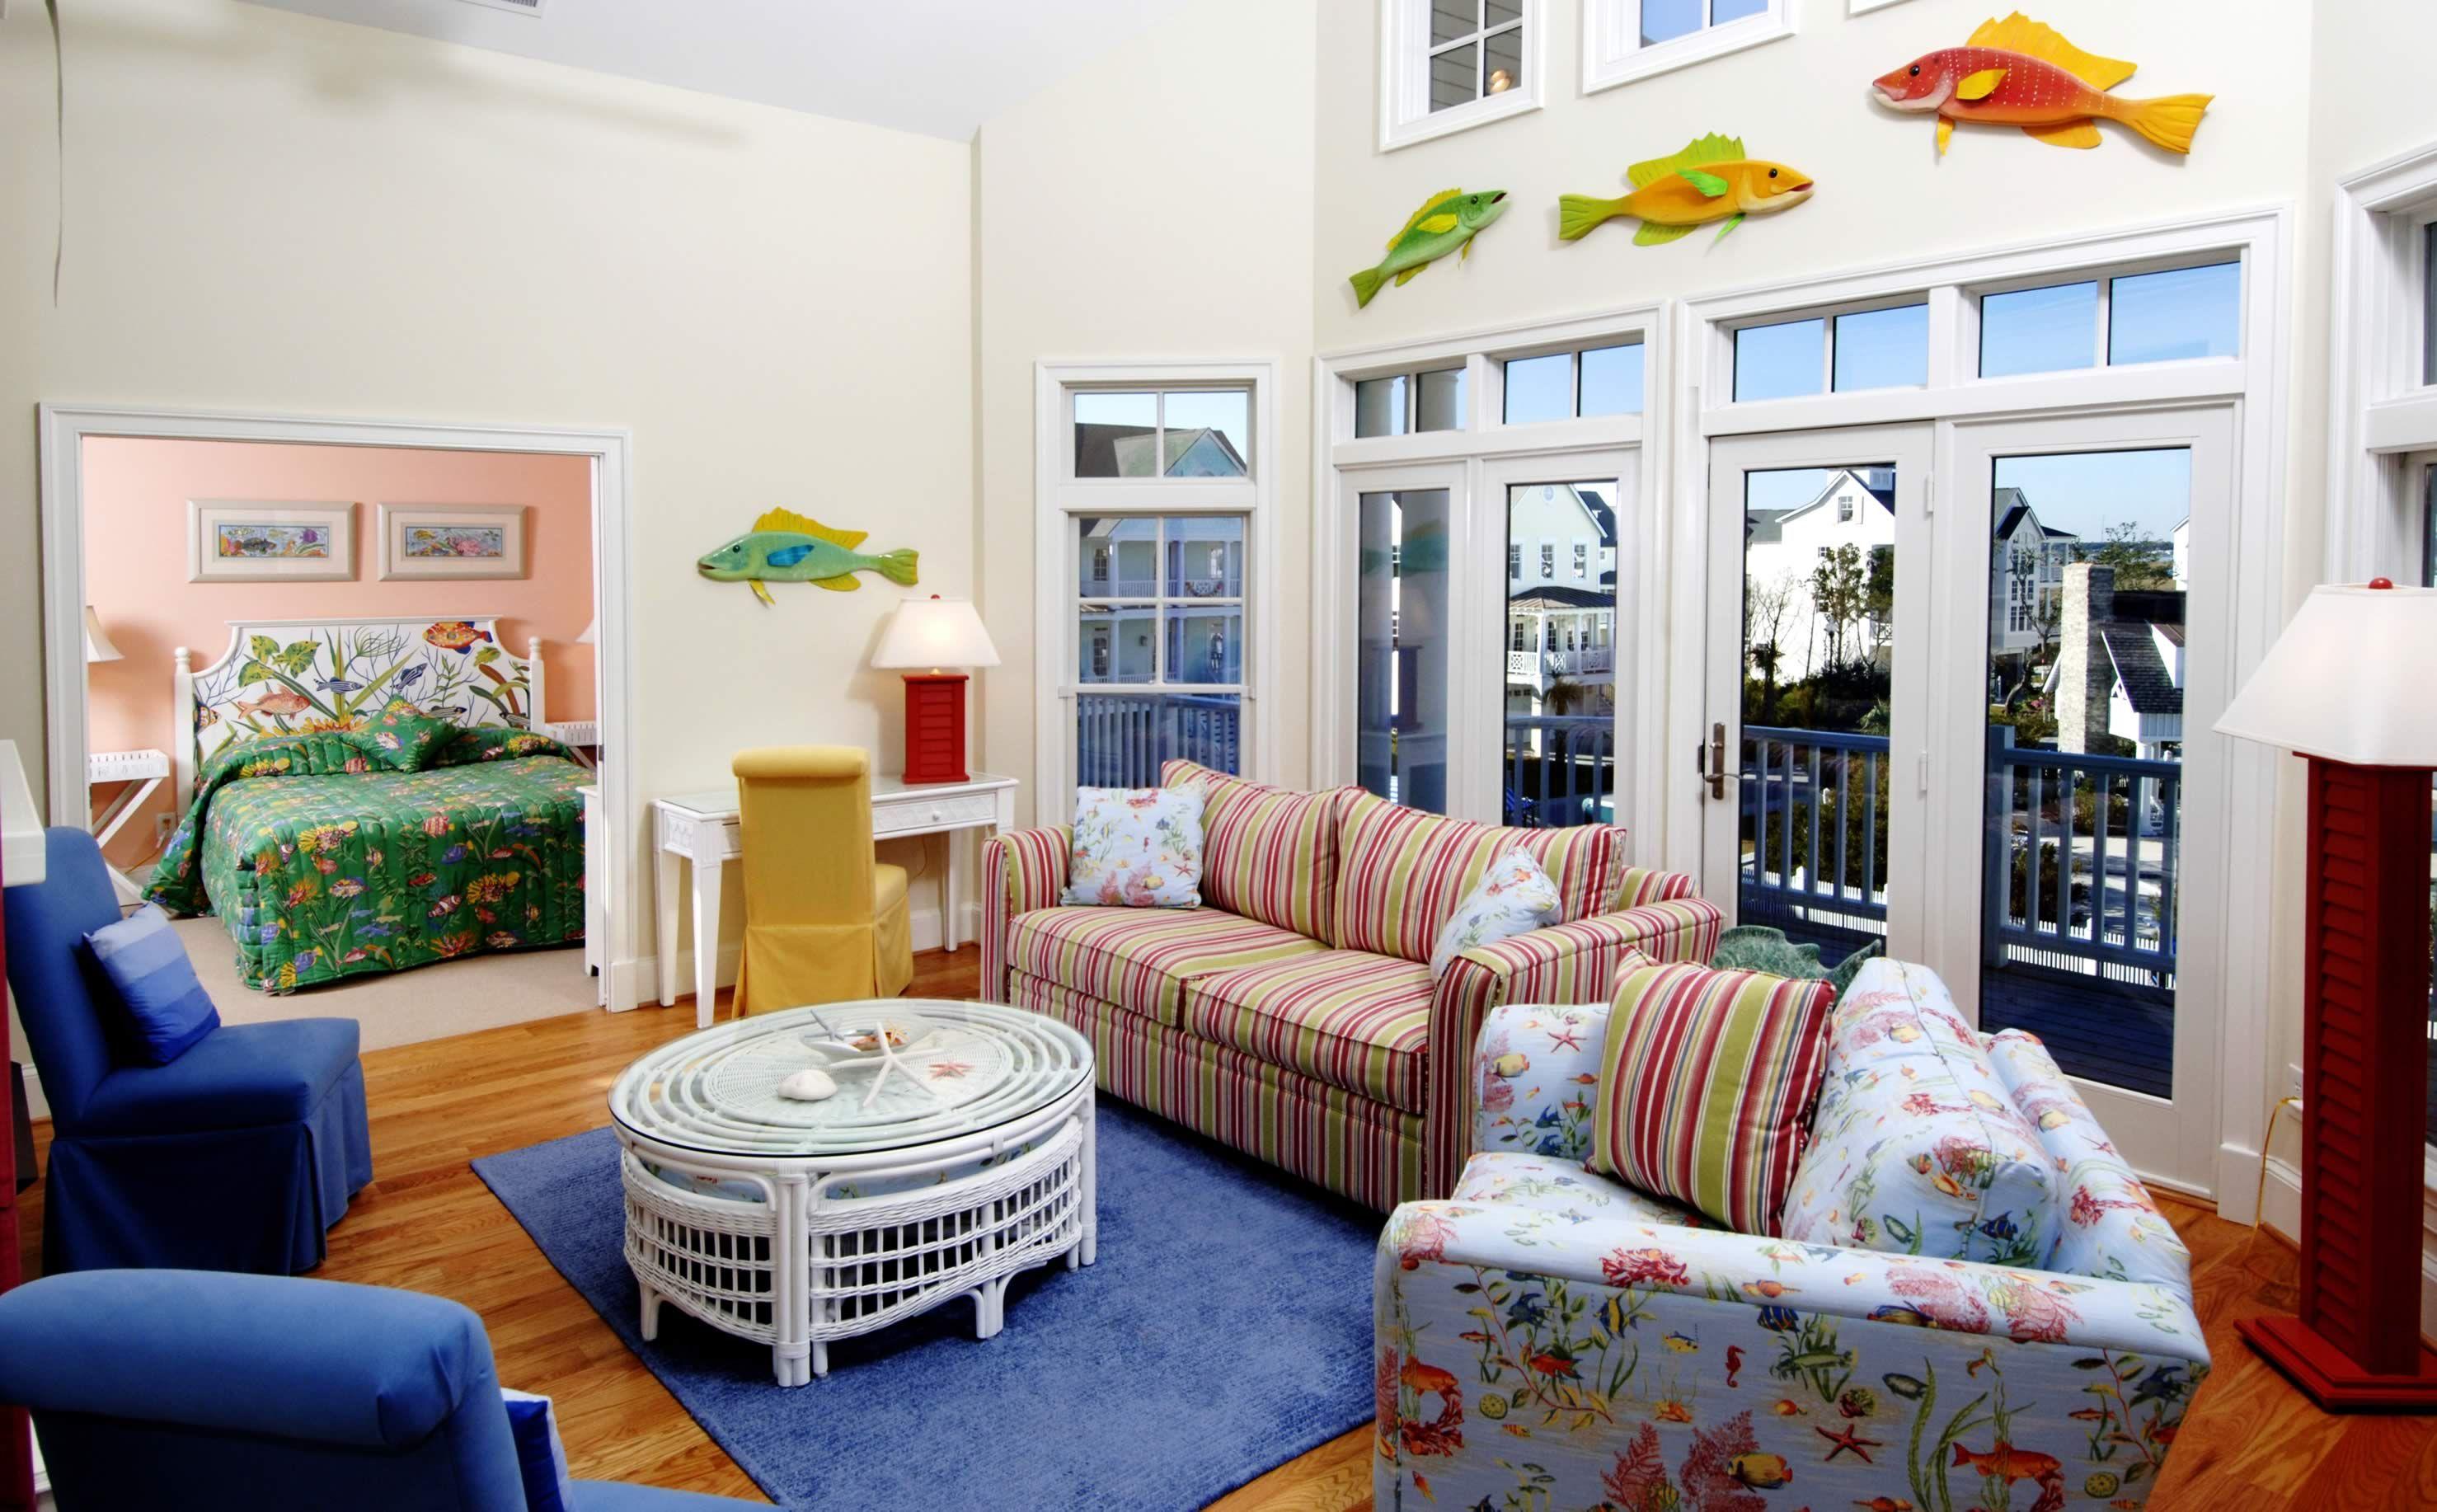 Shore Decor Furniture And Accessories Morehead City, NC